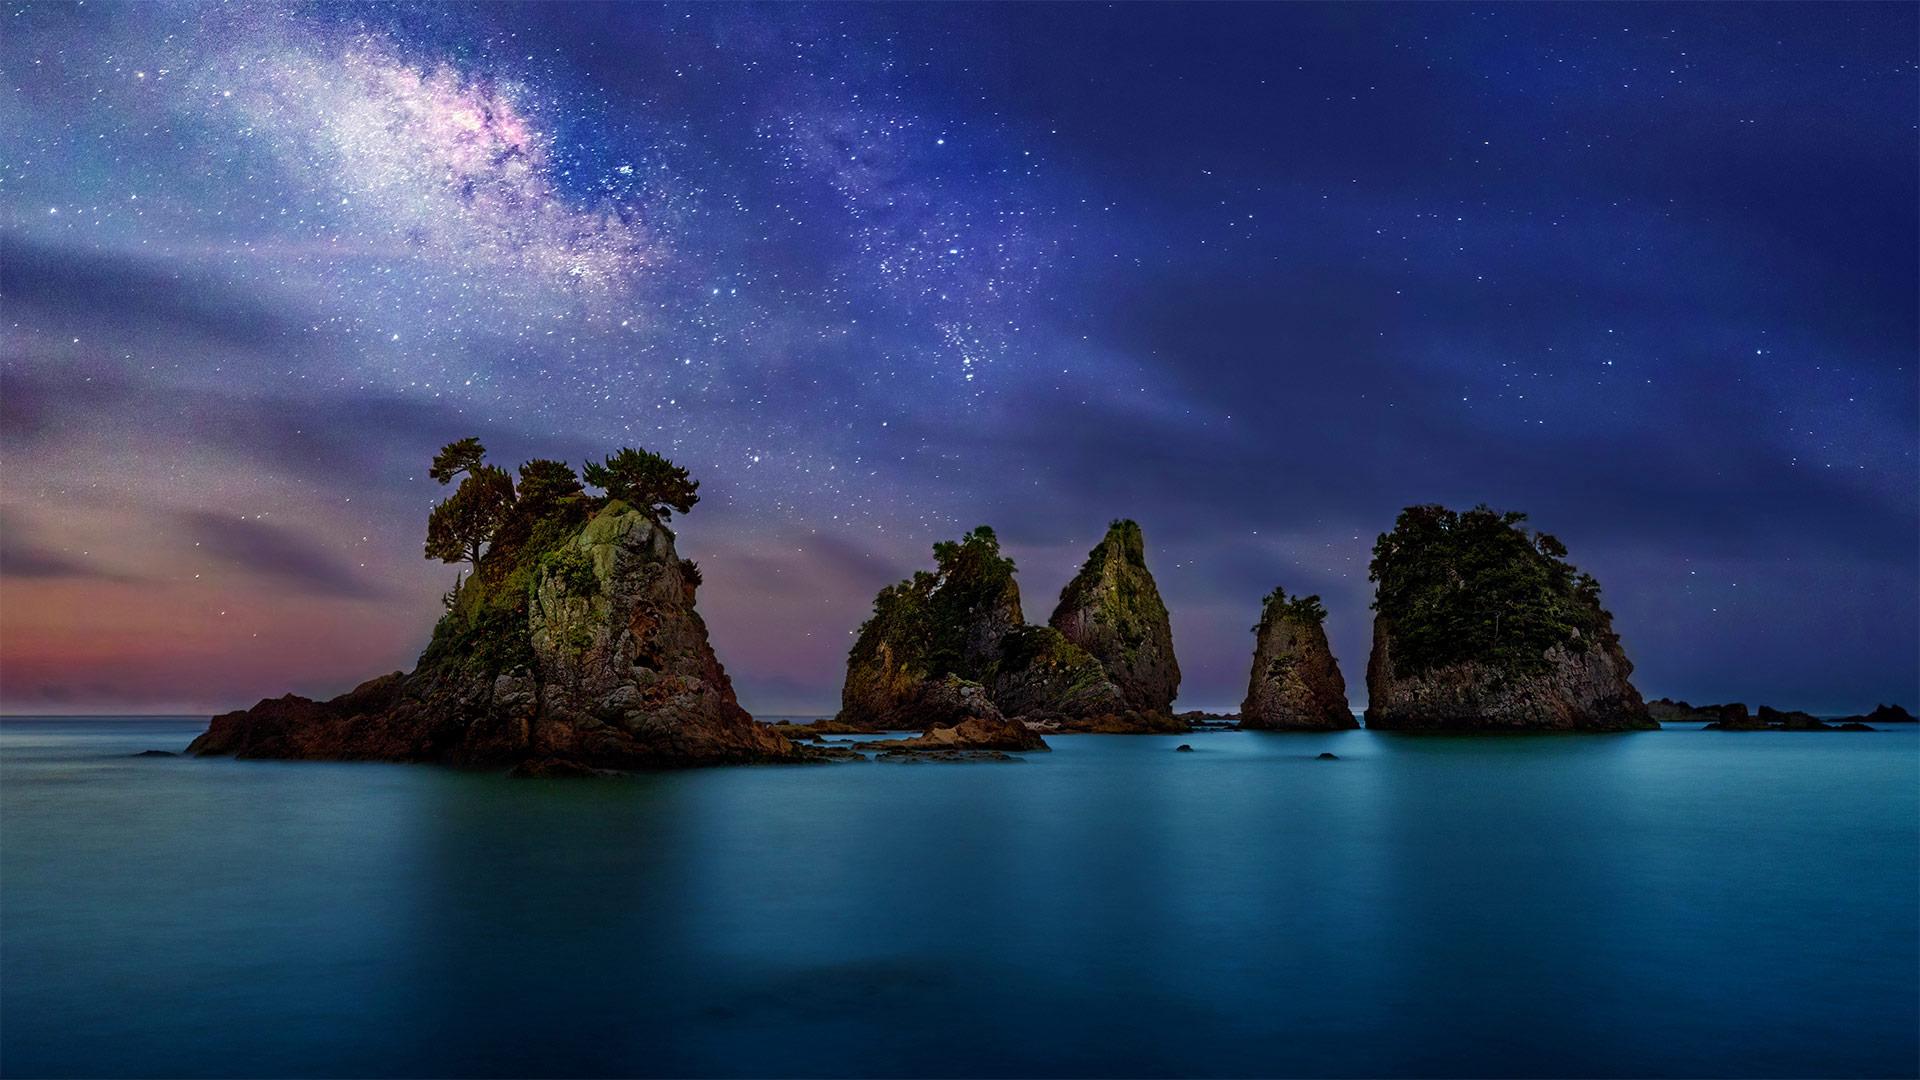 「蓑掛岩」静岡県, 南伊豆町 (© Krzysztof Baranowski/Getty Images)